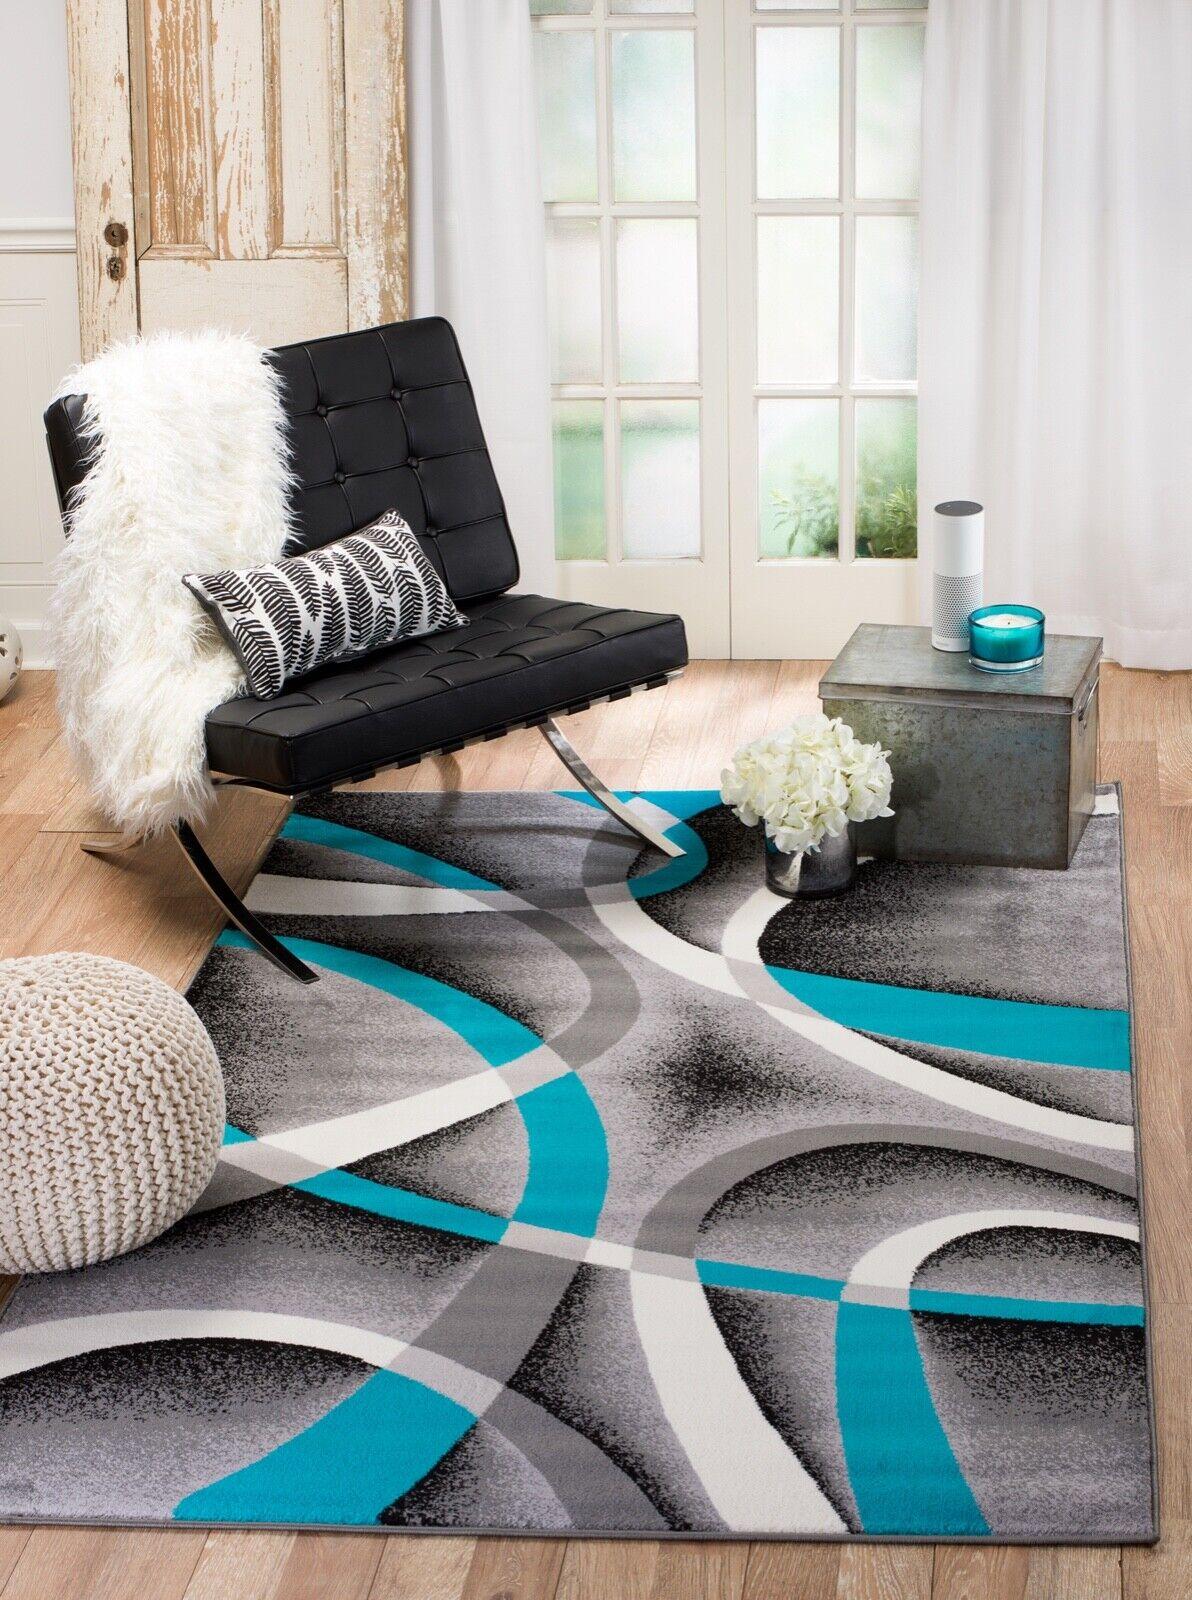 area rug Smt#35 Modern gray blue white soft pile sizes 2x3 3